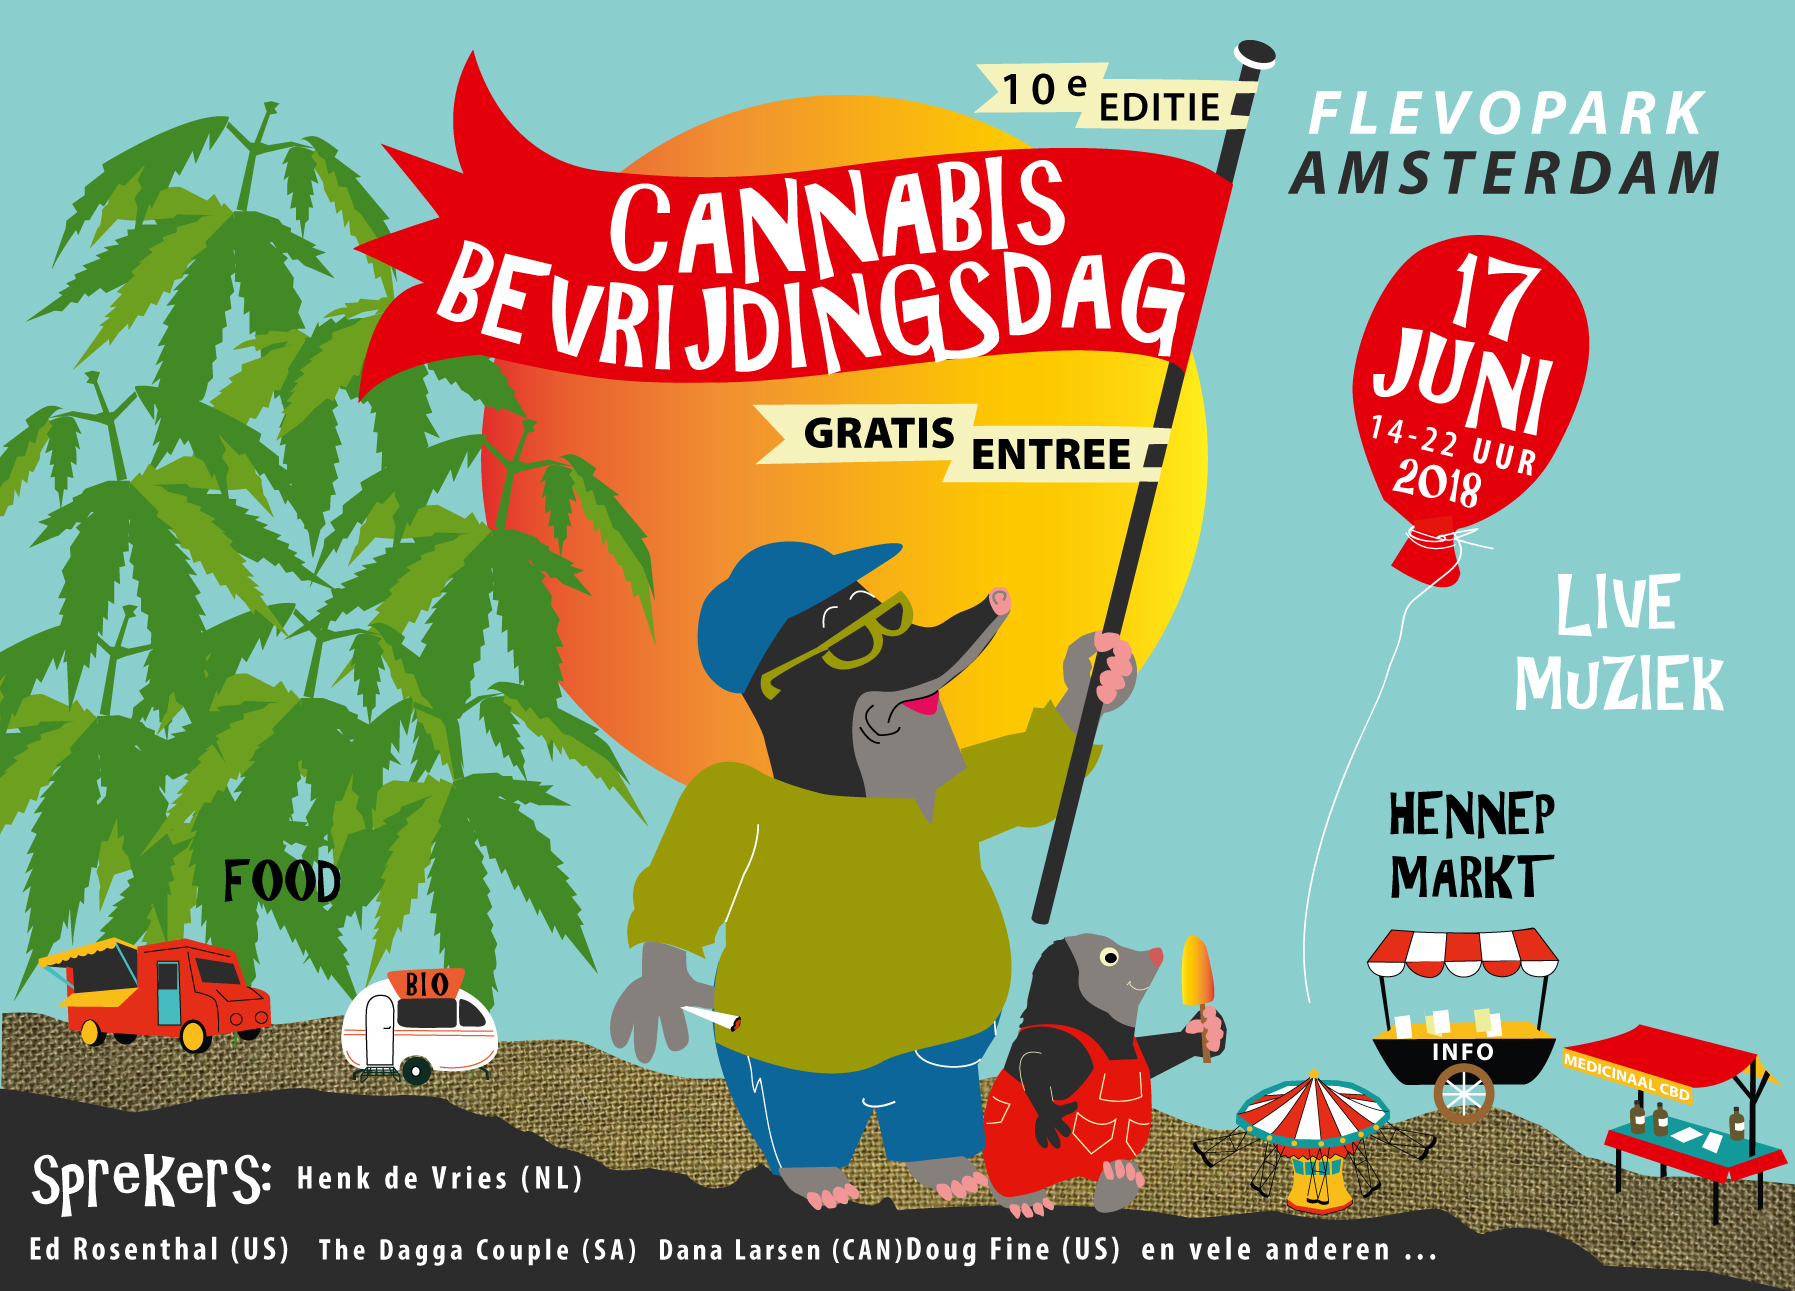 Cannabis Bevrijdingsdag